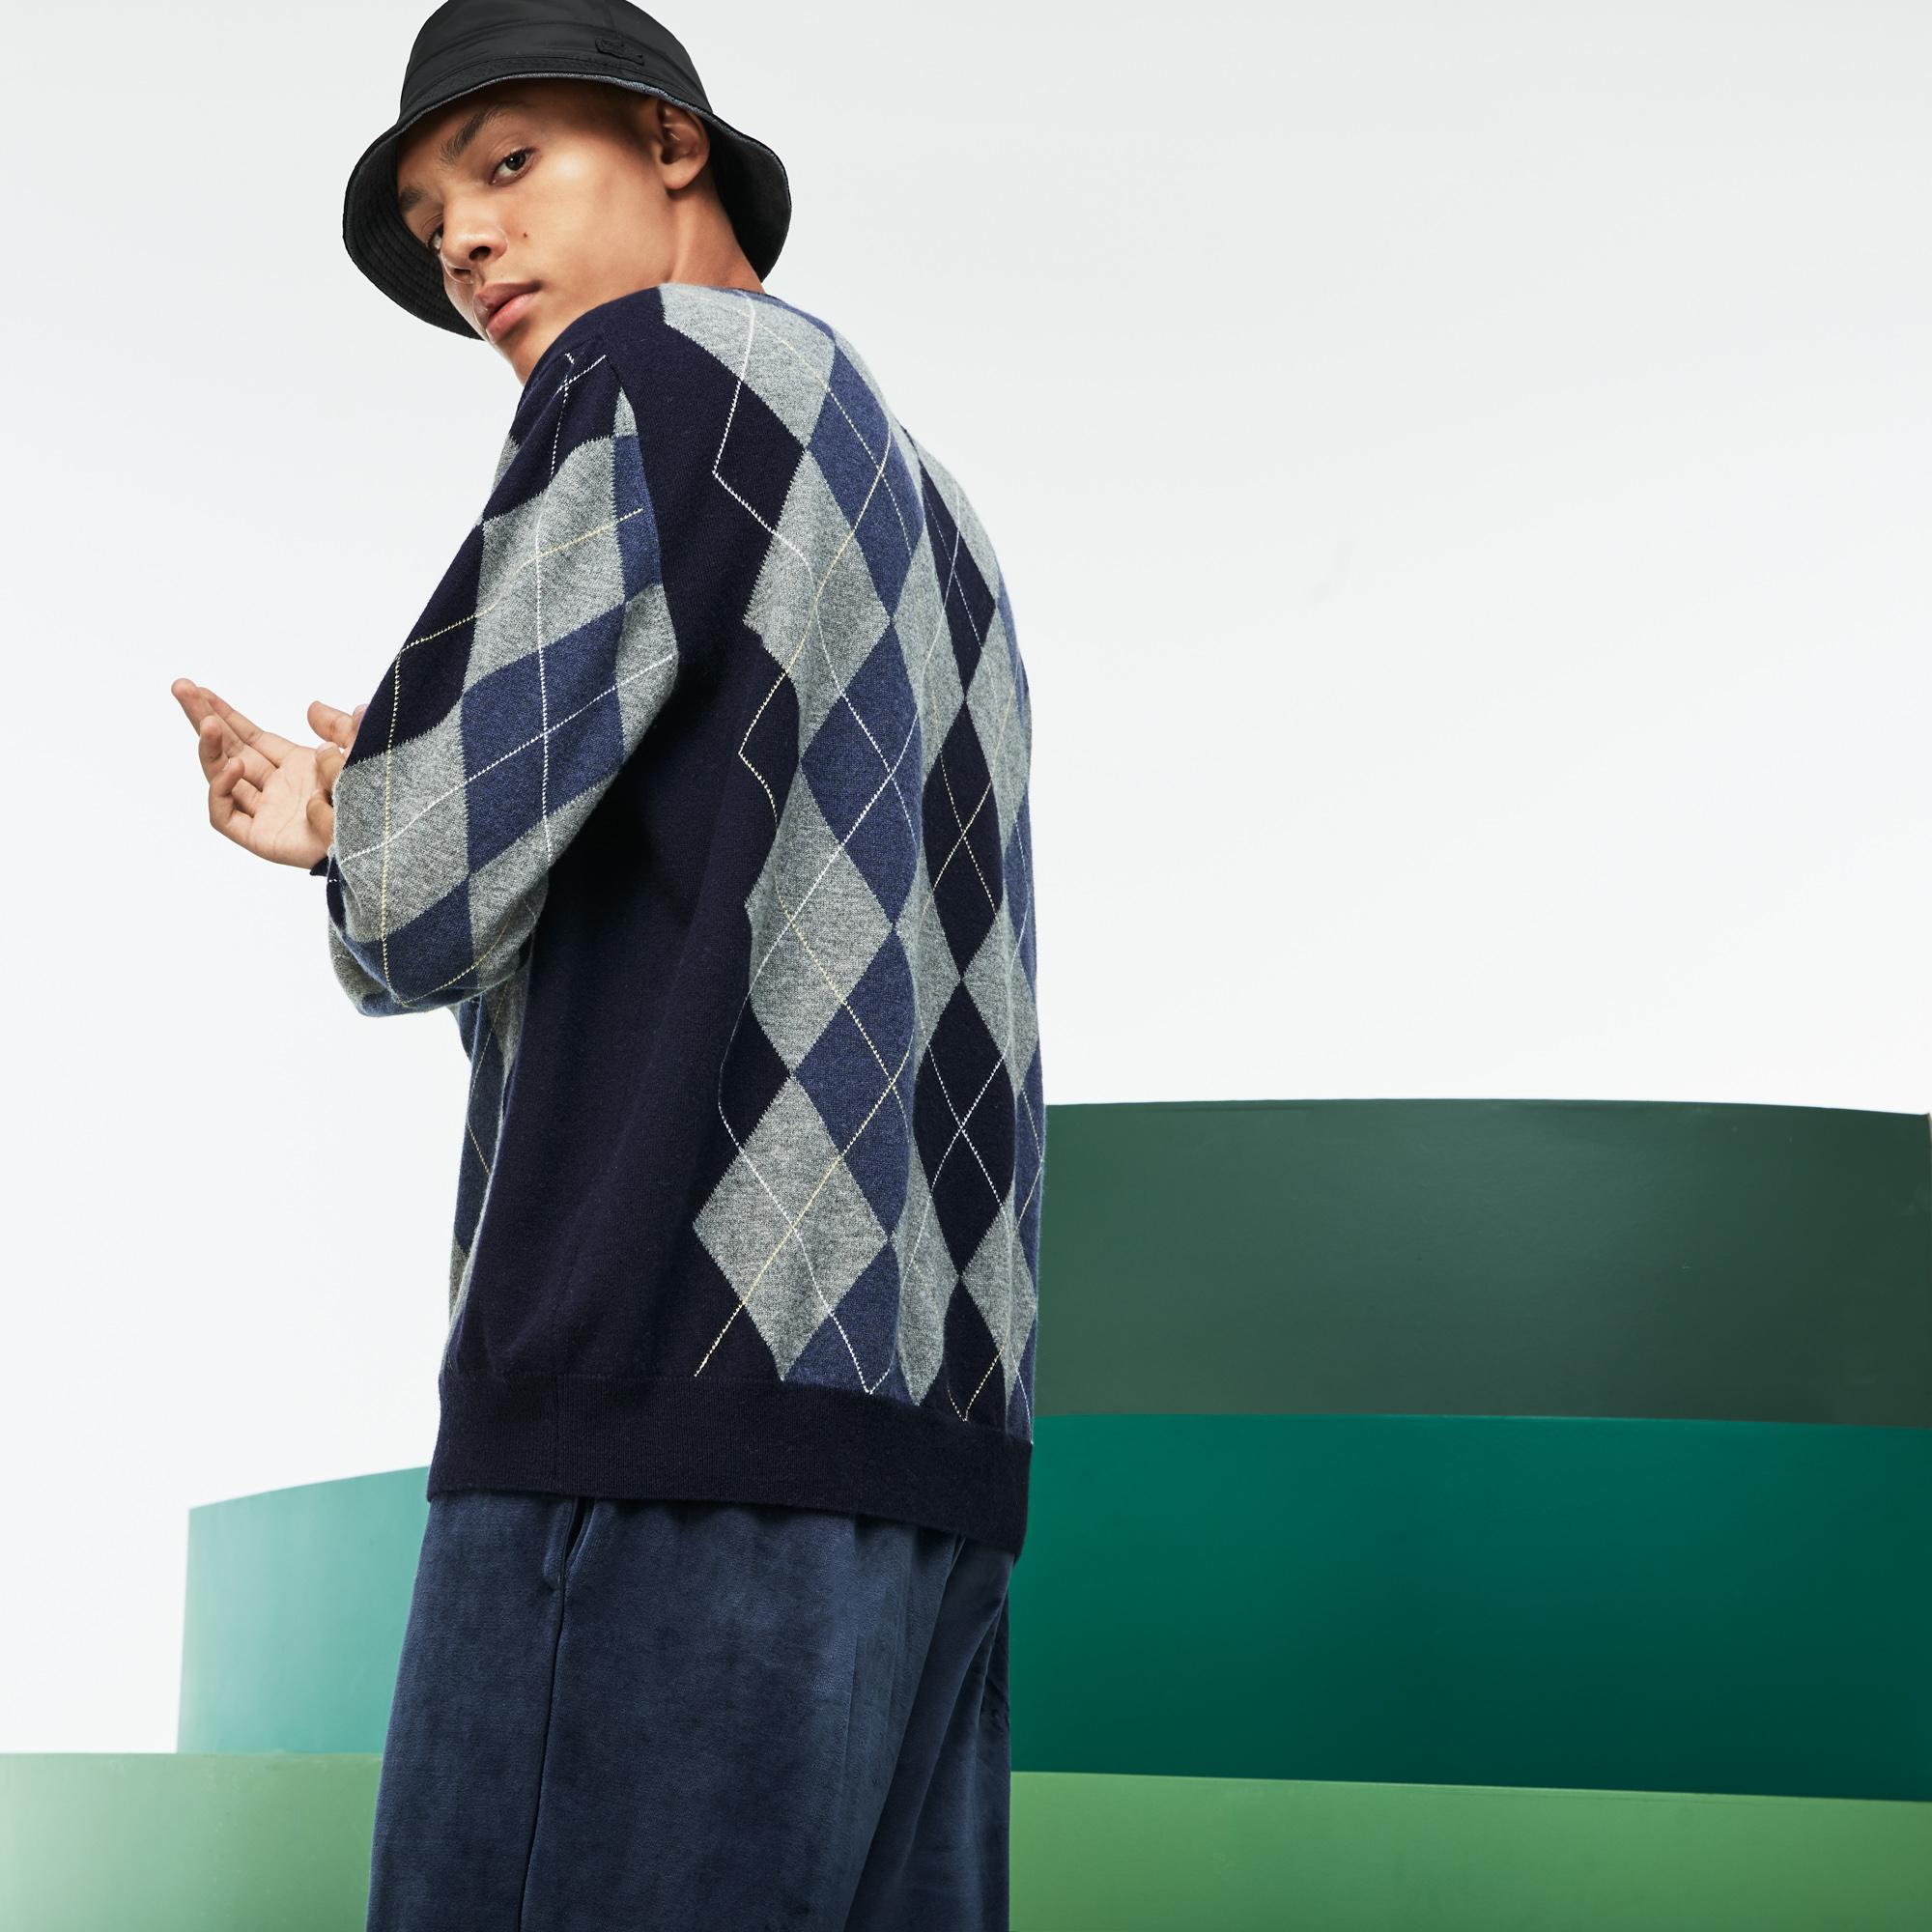 Фото 2 - Мужской свитер Lacoste темно-синего цвета